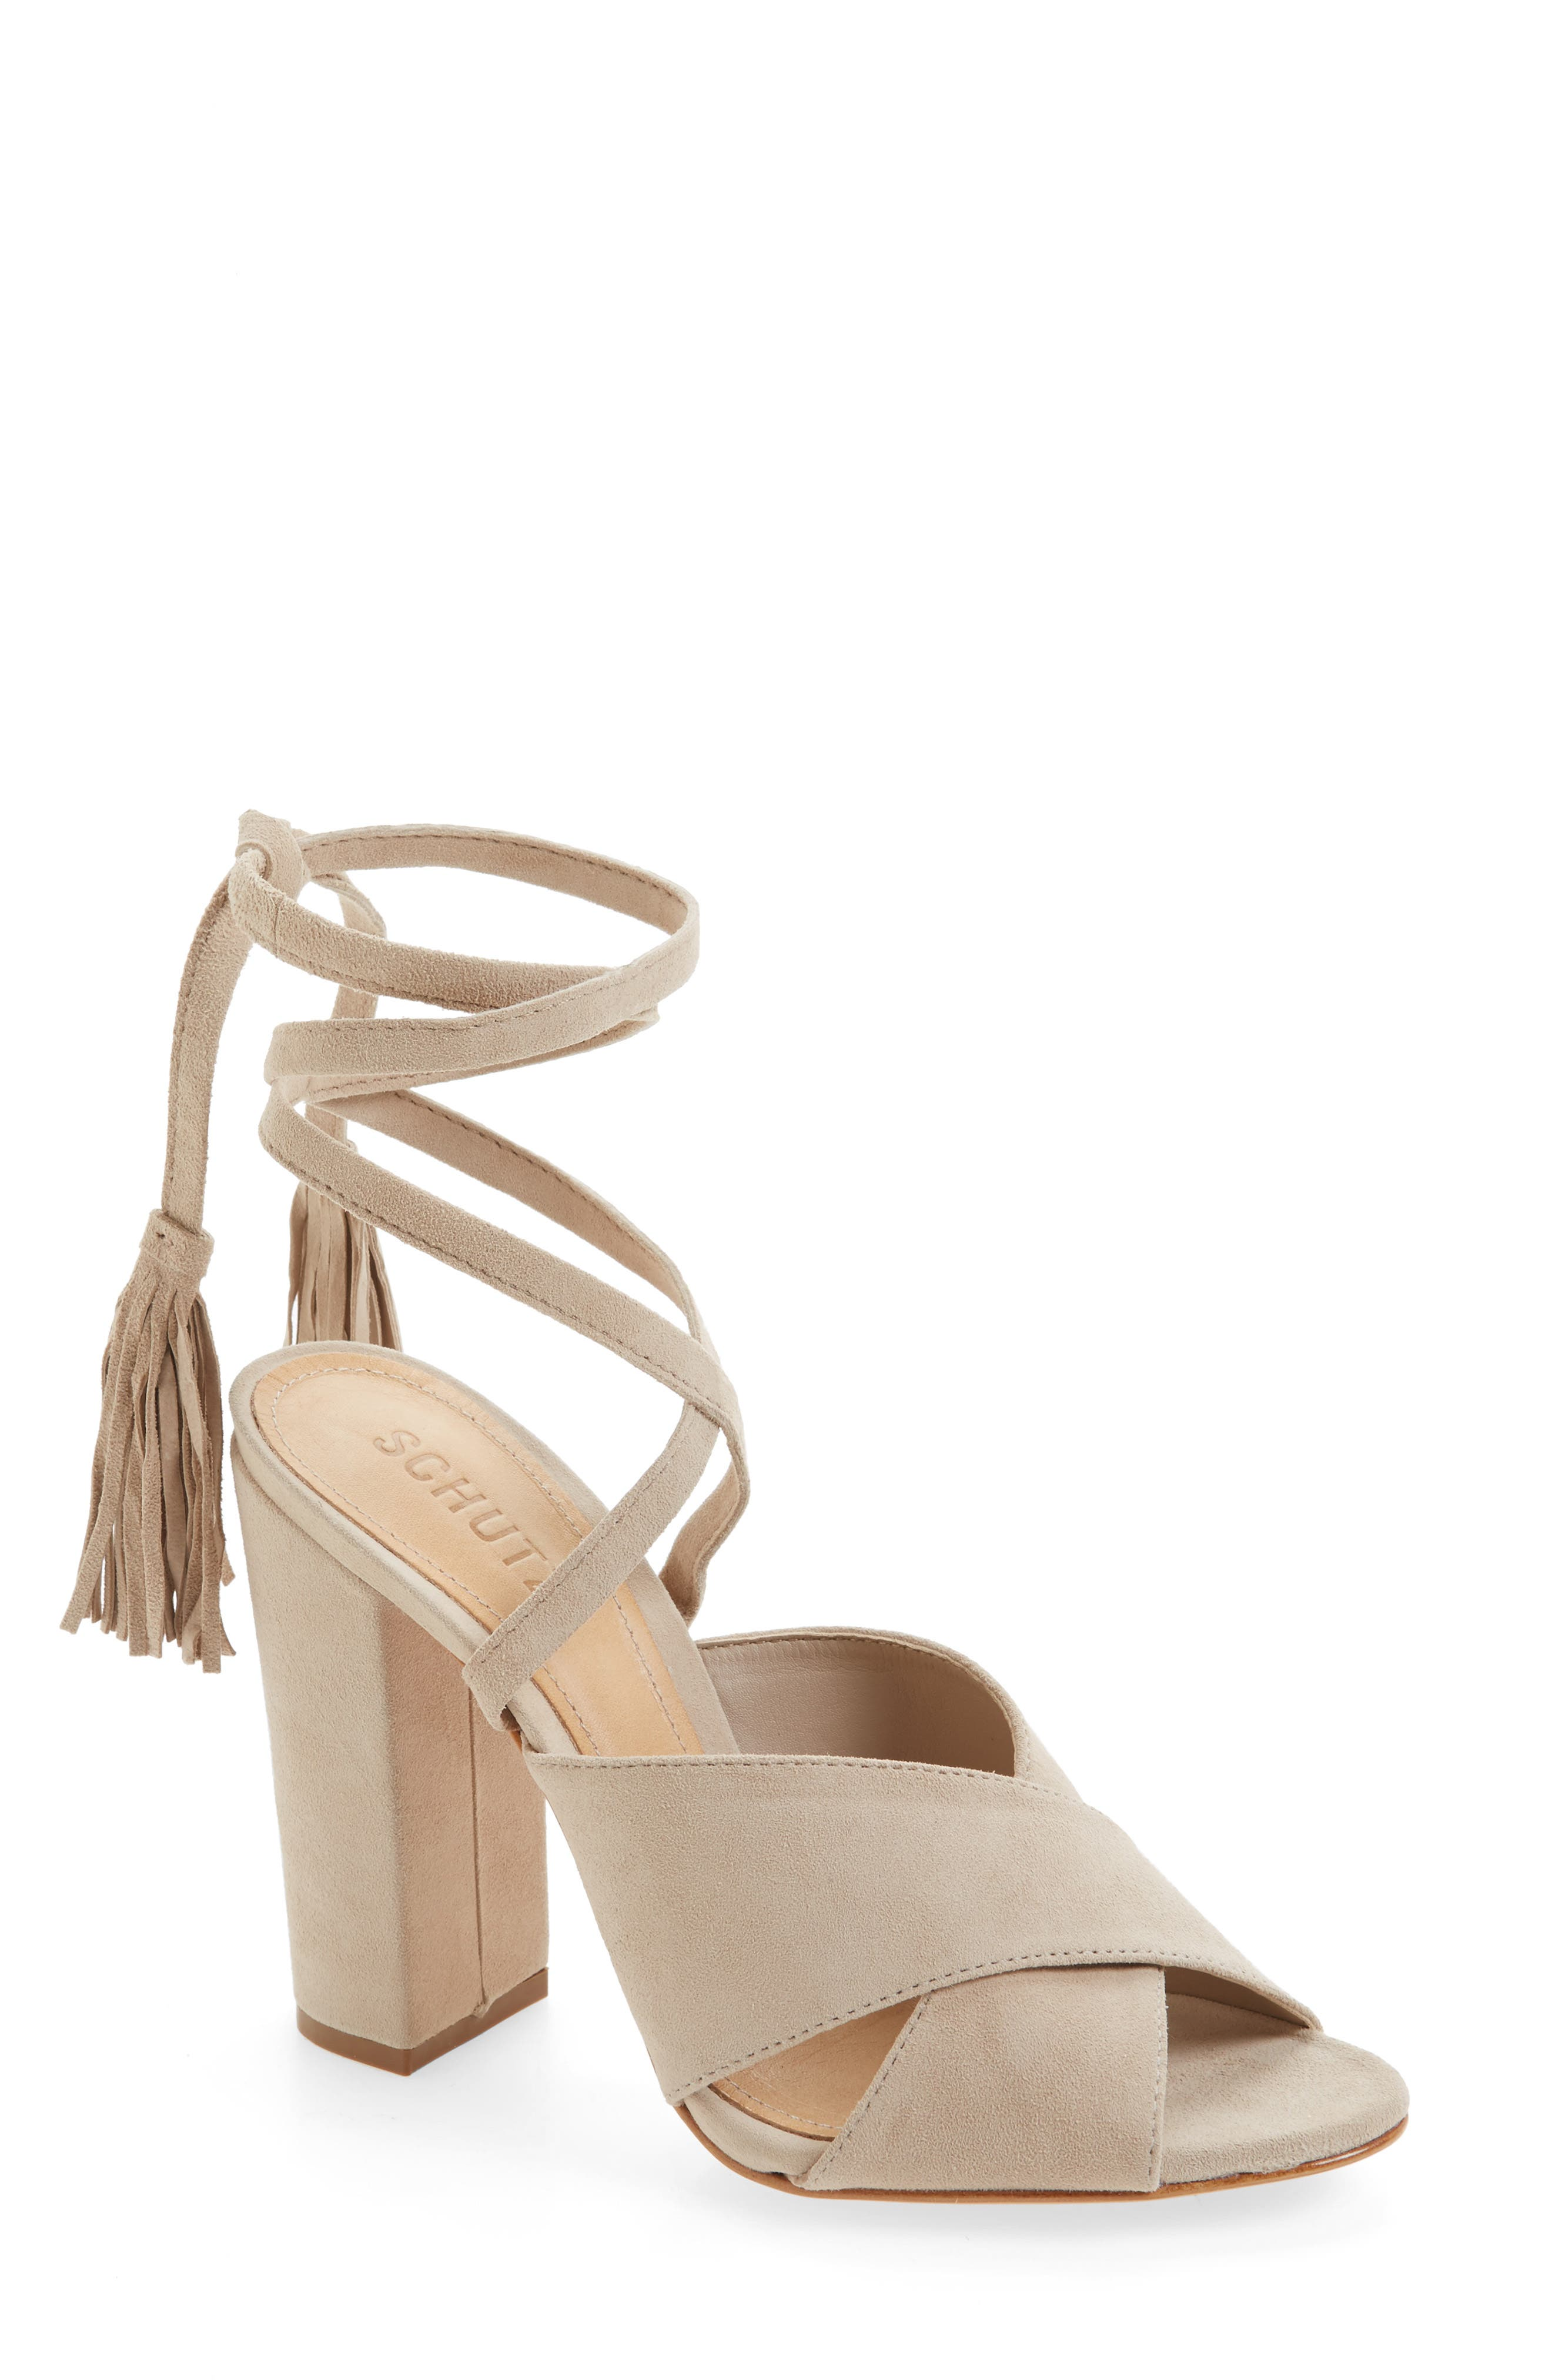 Main Image - Schutz Damila Wraparound Tassel Sandal (Women)